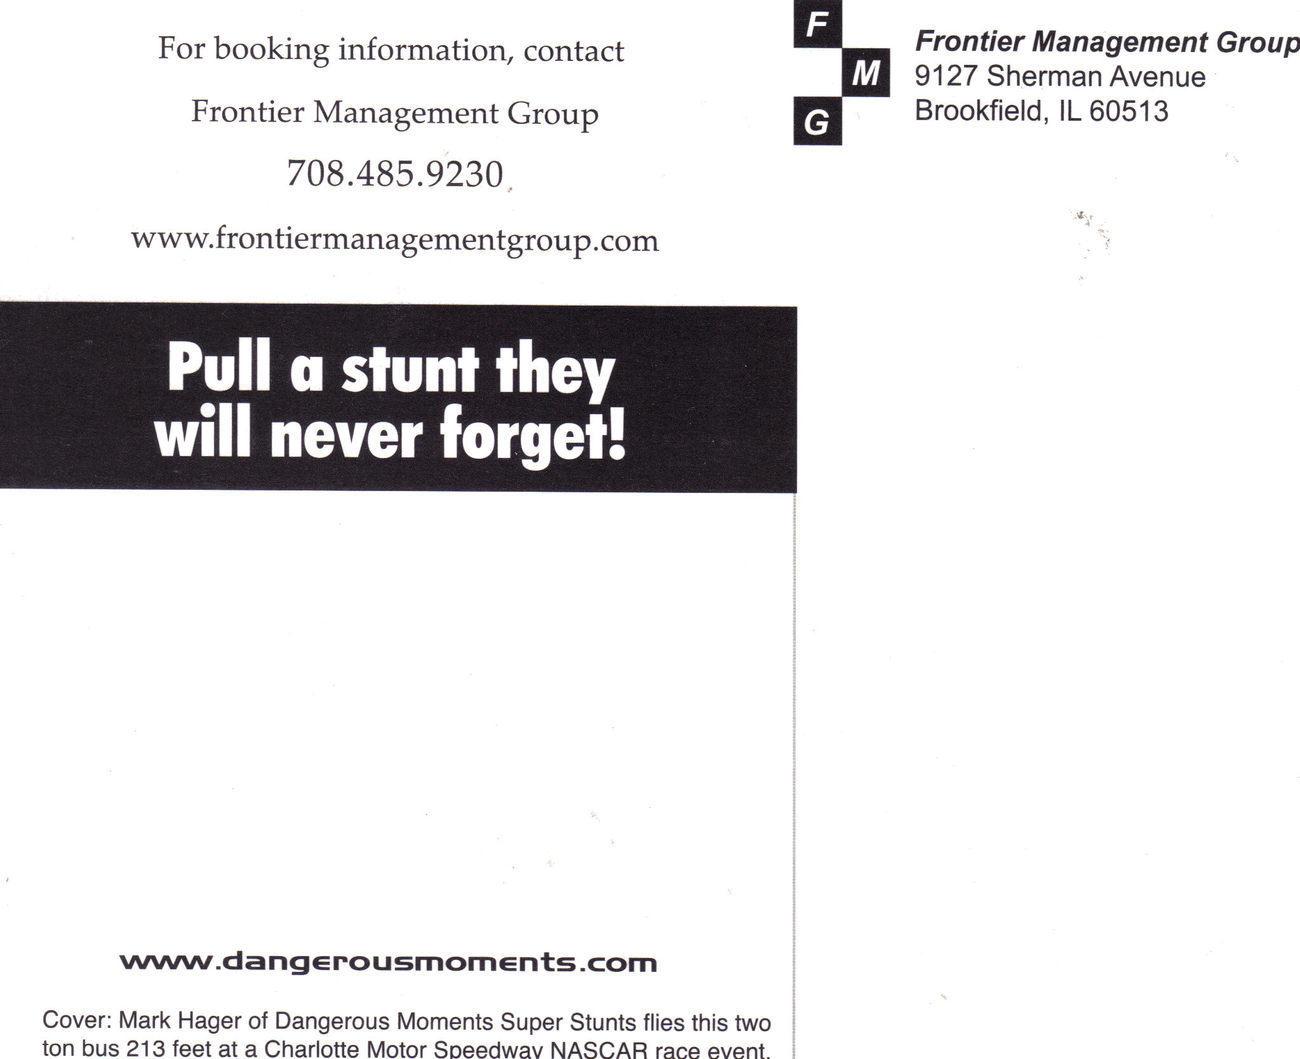 MARK HAGER Dangerous Moments SUPER STUNT Photo Print